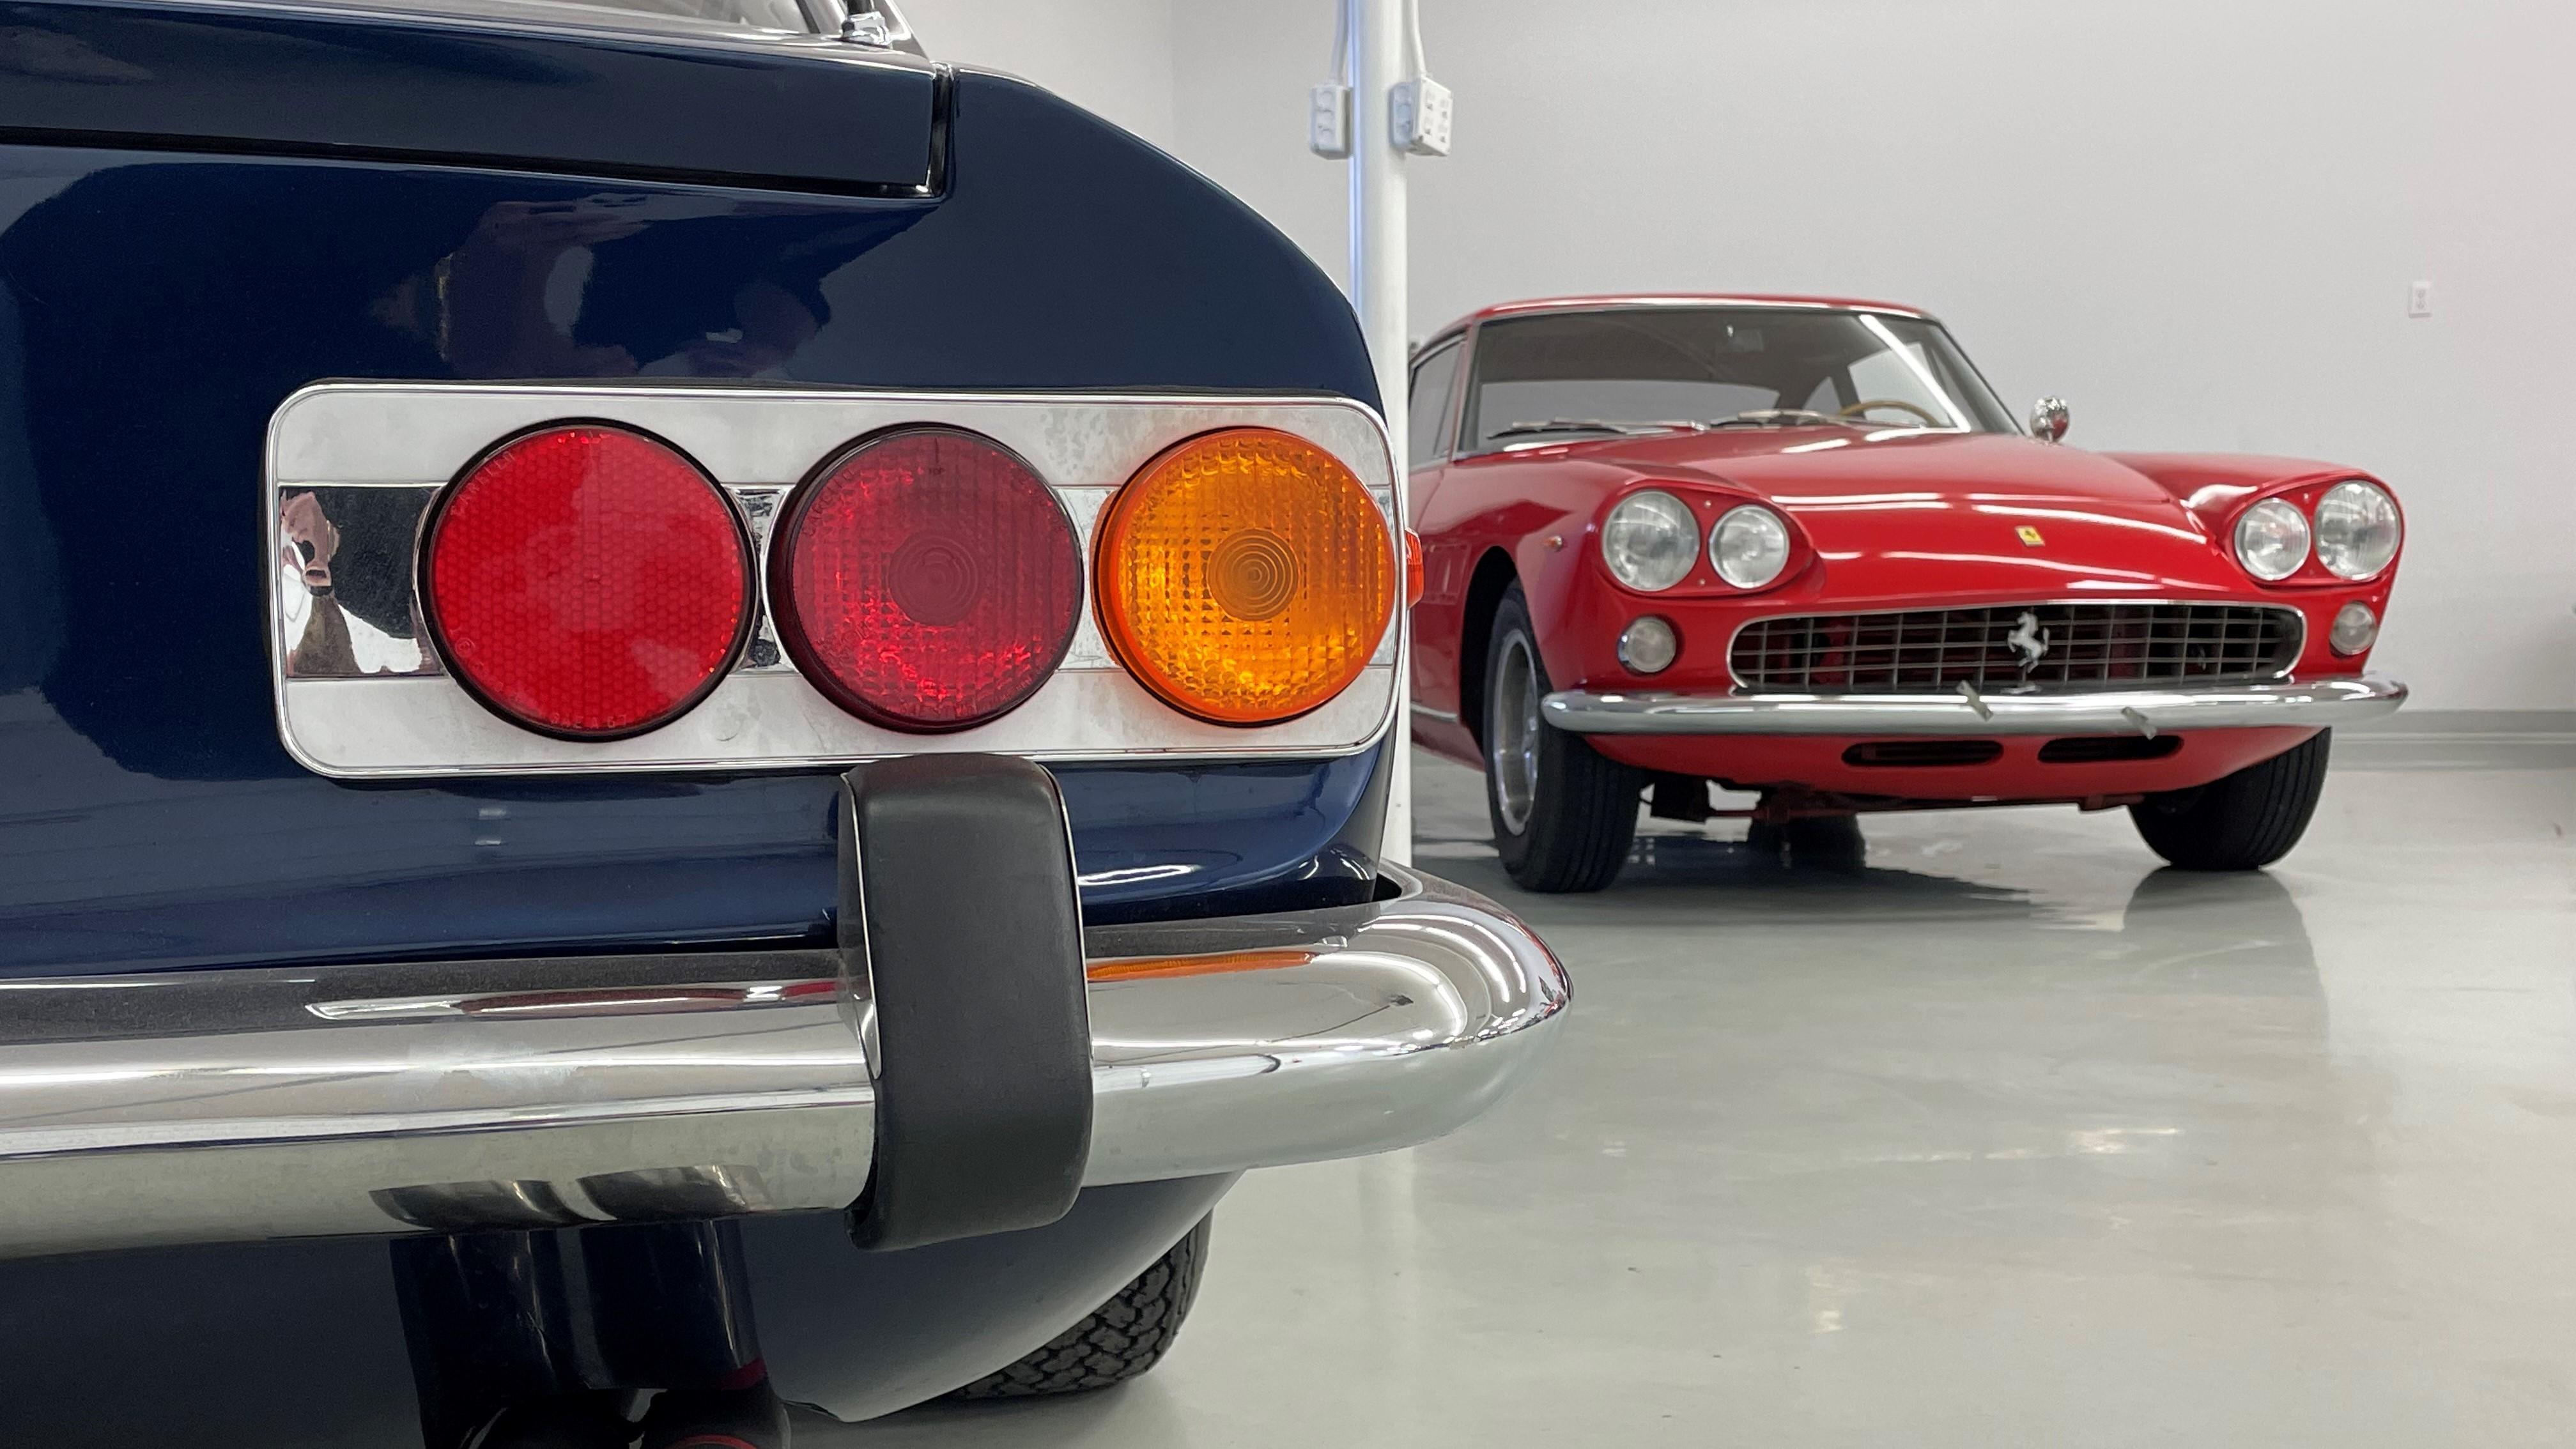 Ferrari 365 GT 2+2 Ferrari 330GT 2+2 - Farland Classic Restoration